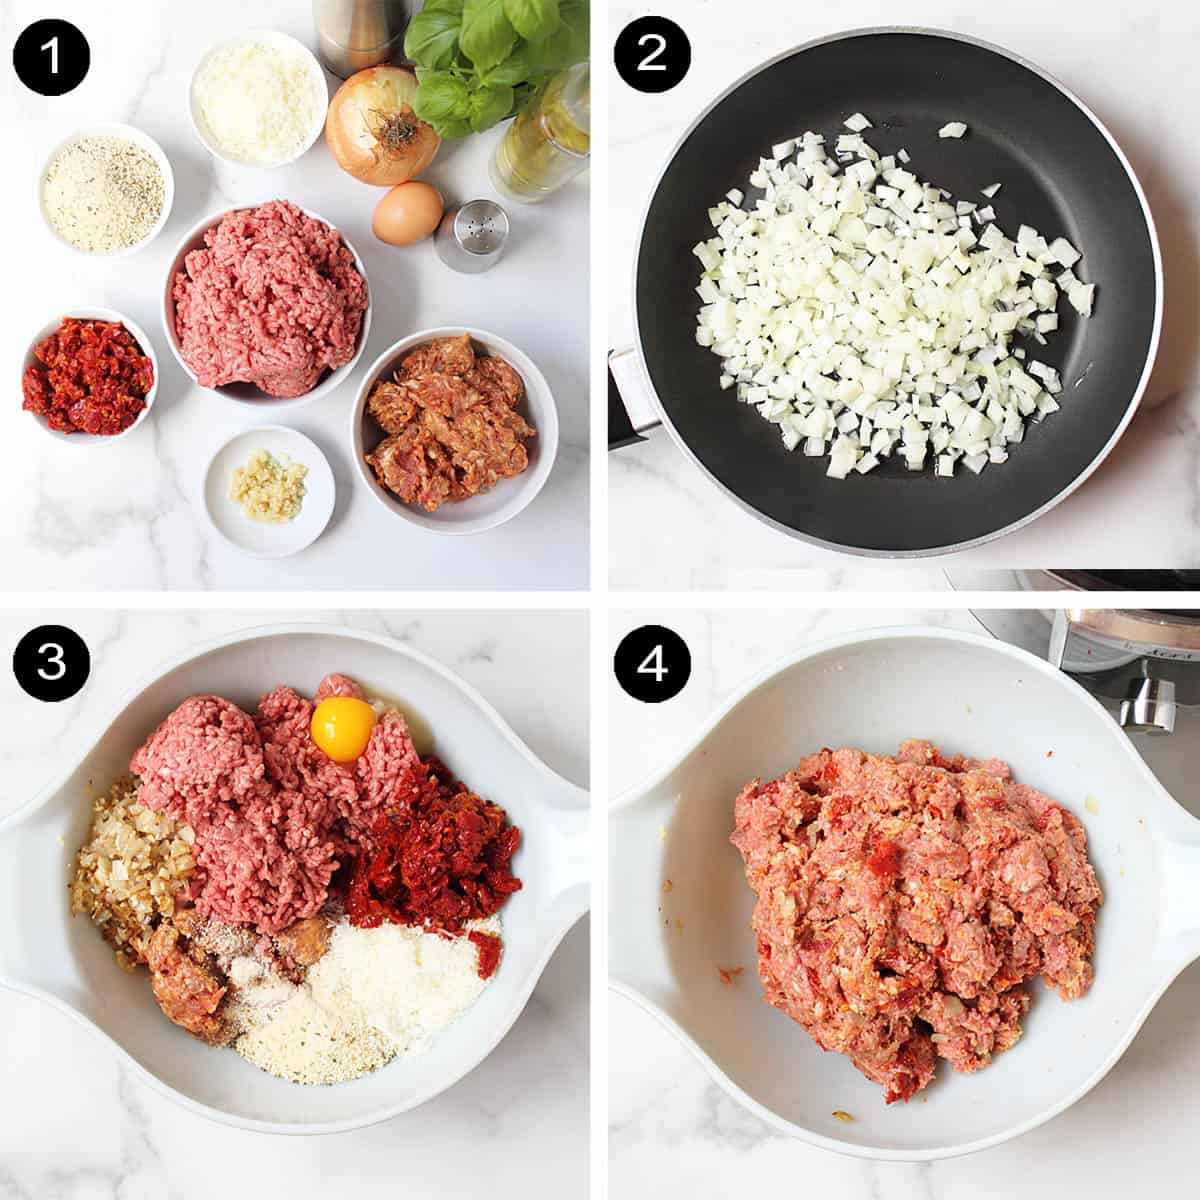 Steps to make Italian meatloaf.